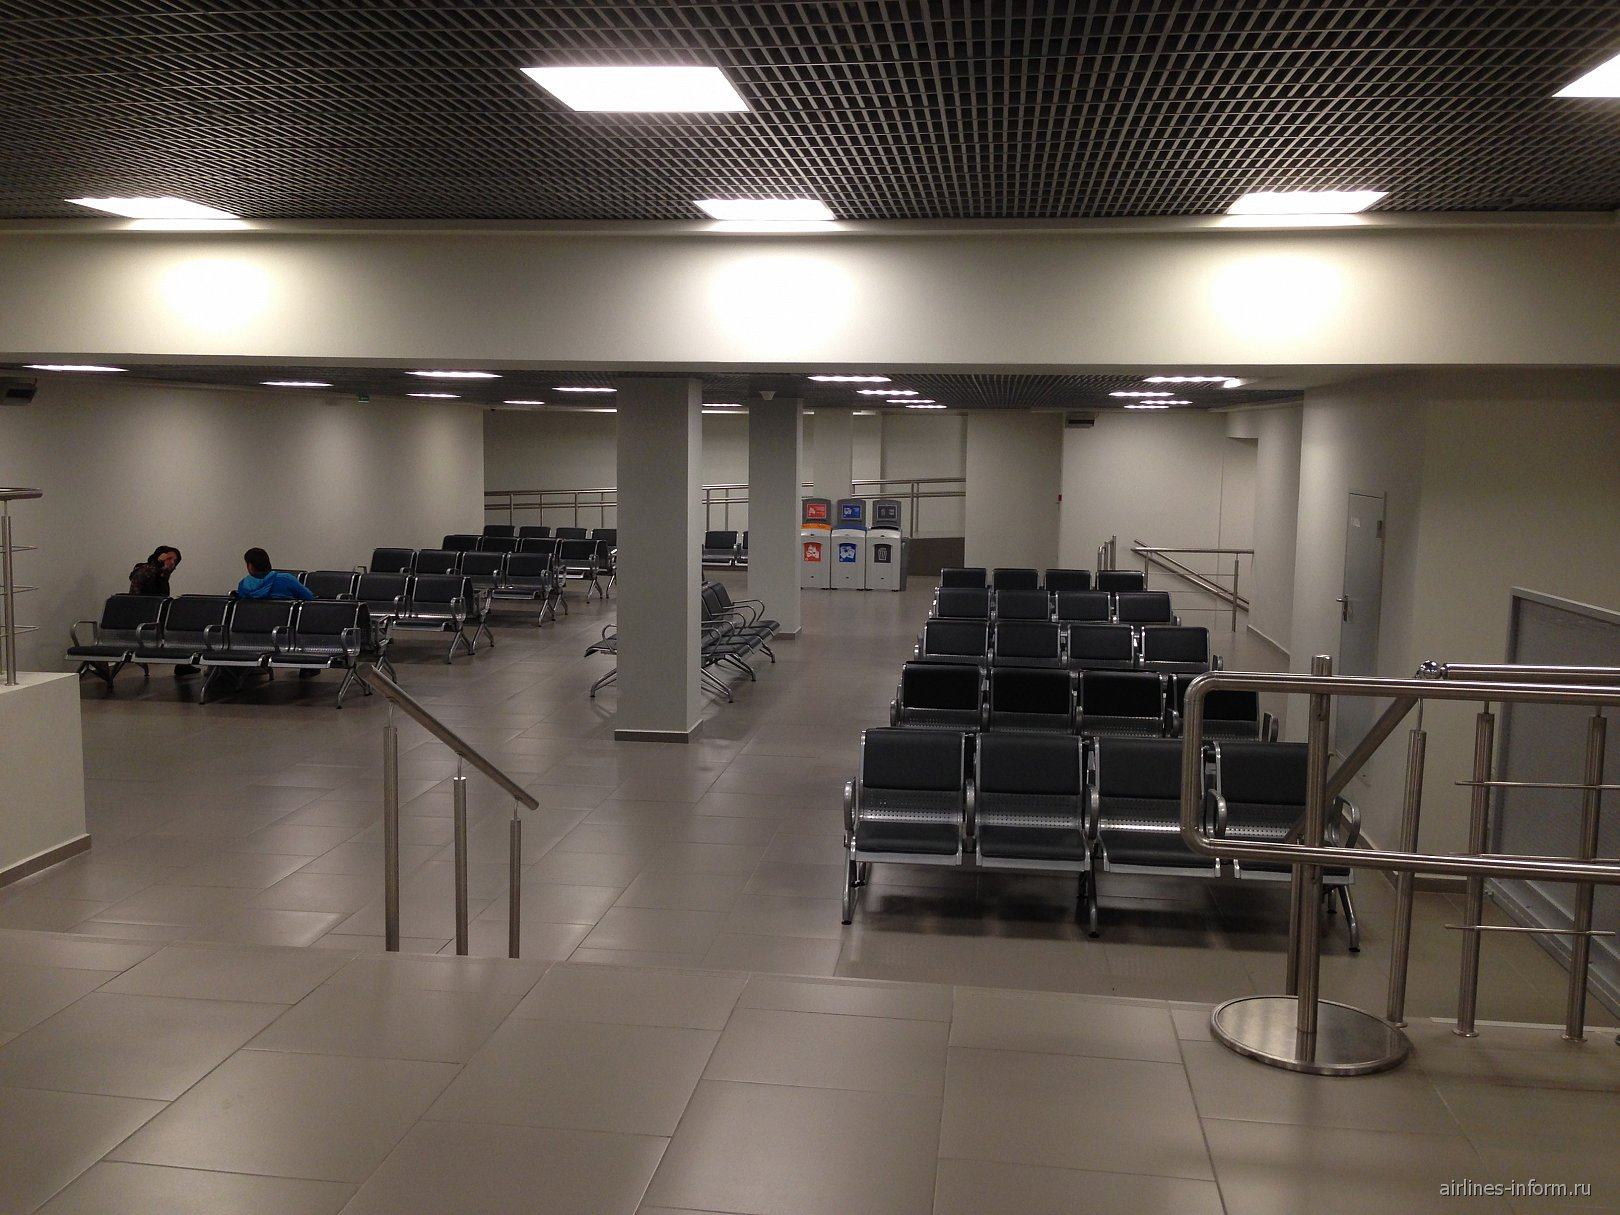 Удаленный зал ожидания в аэропорту Пулково